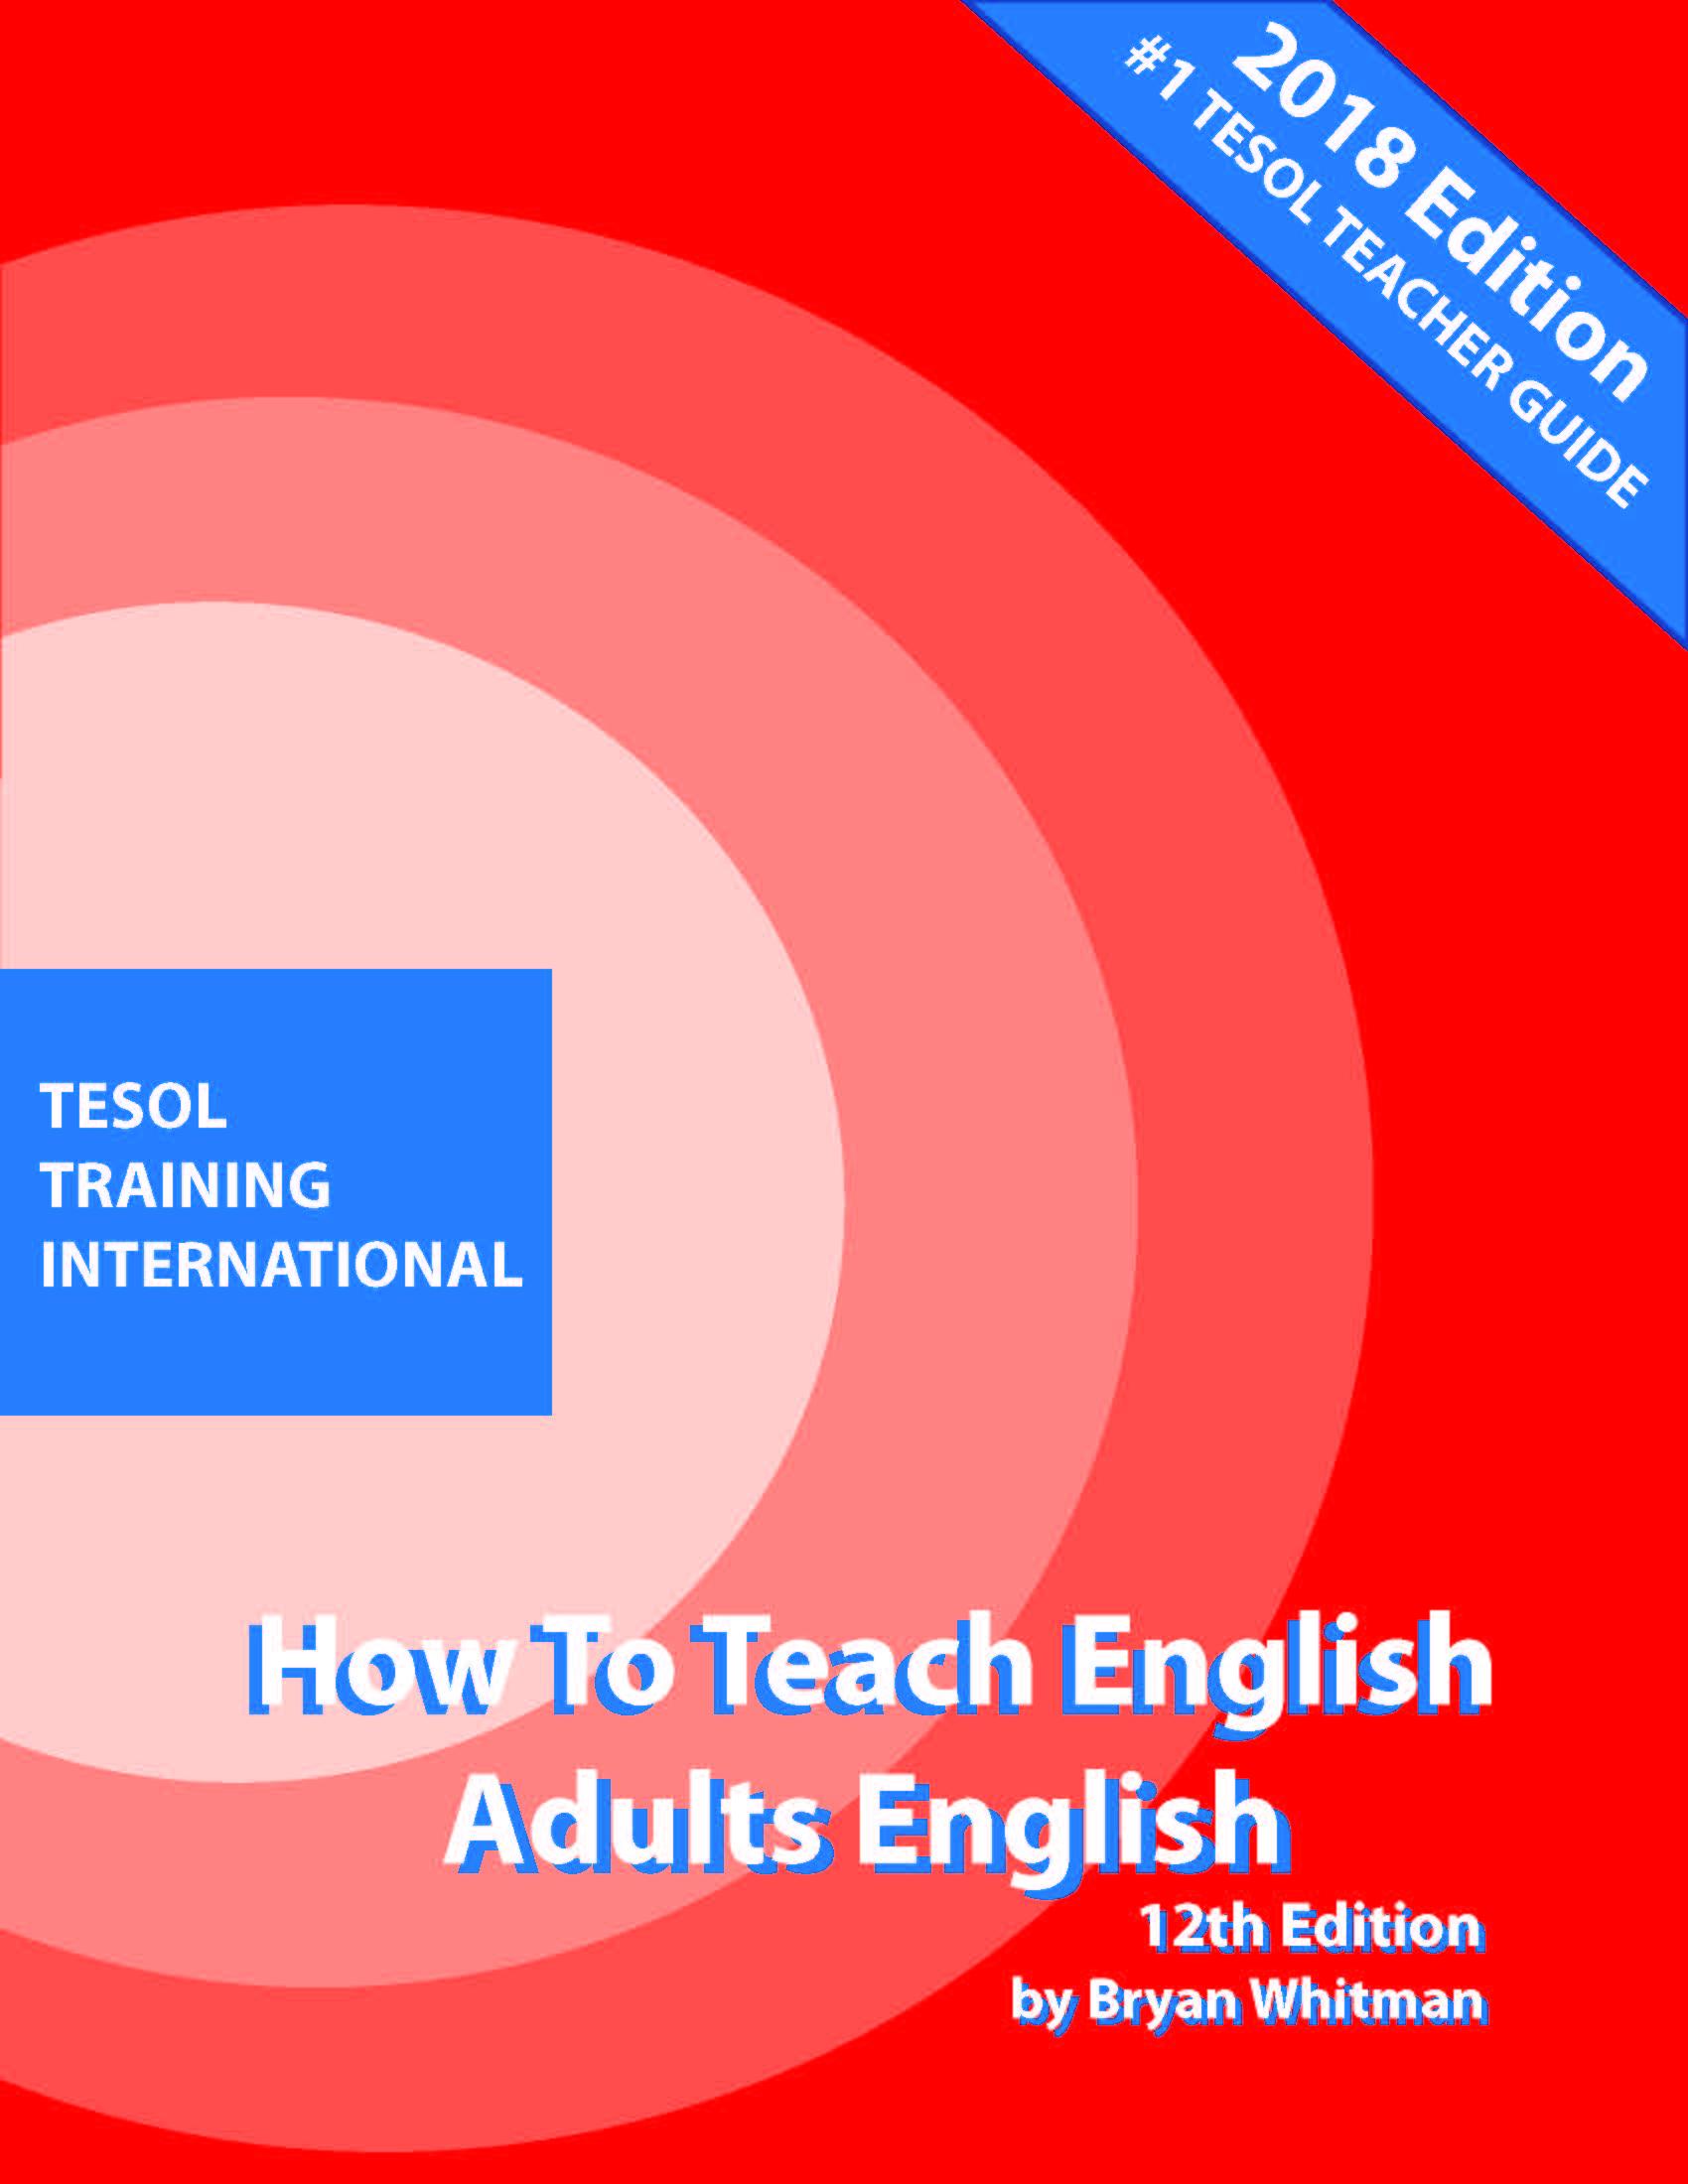 Teaching English to Adults